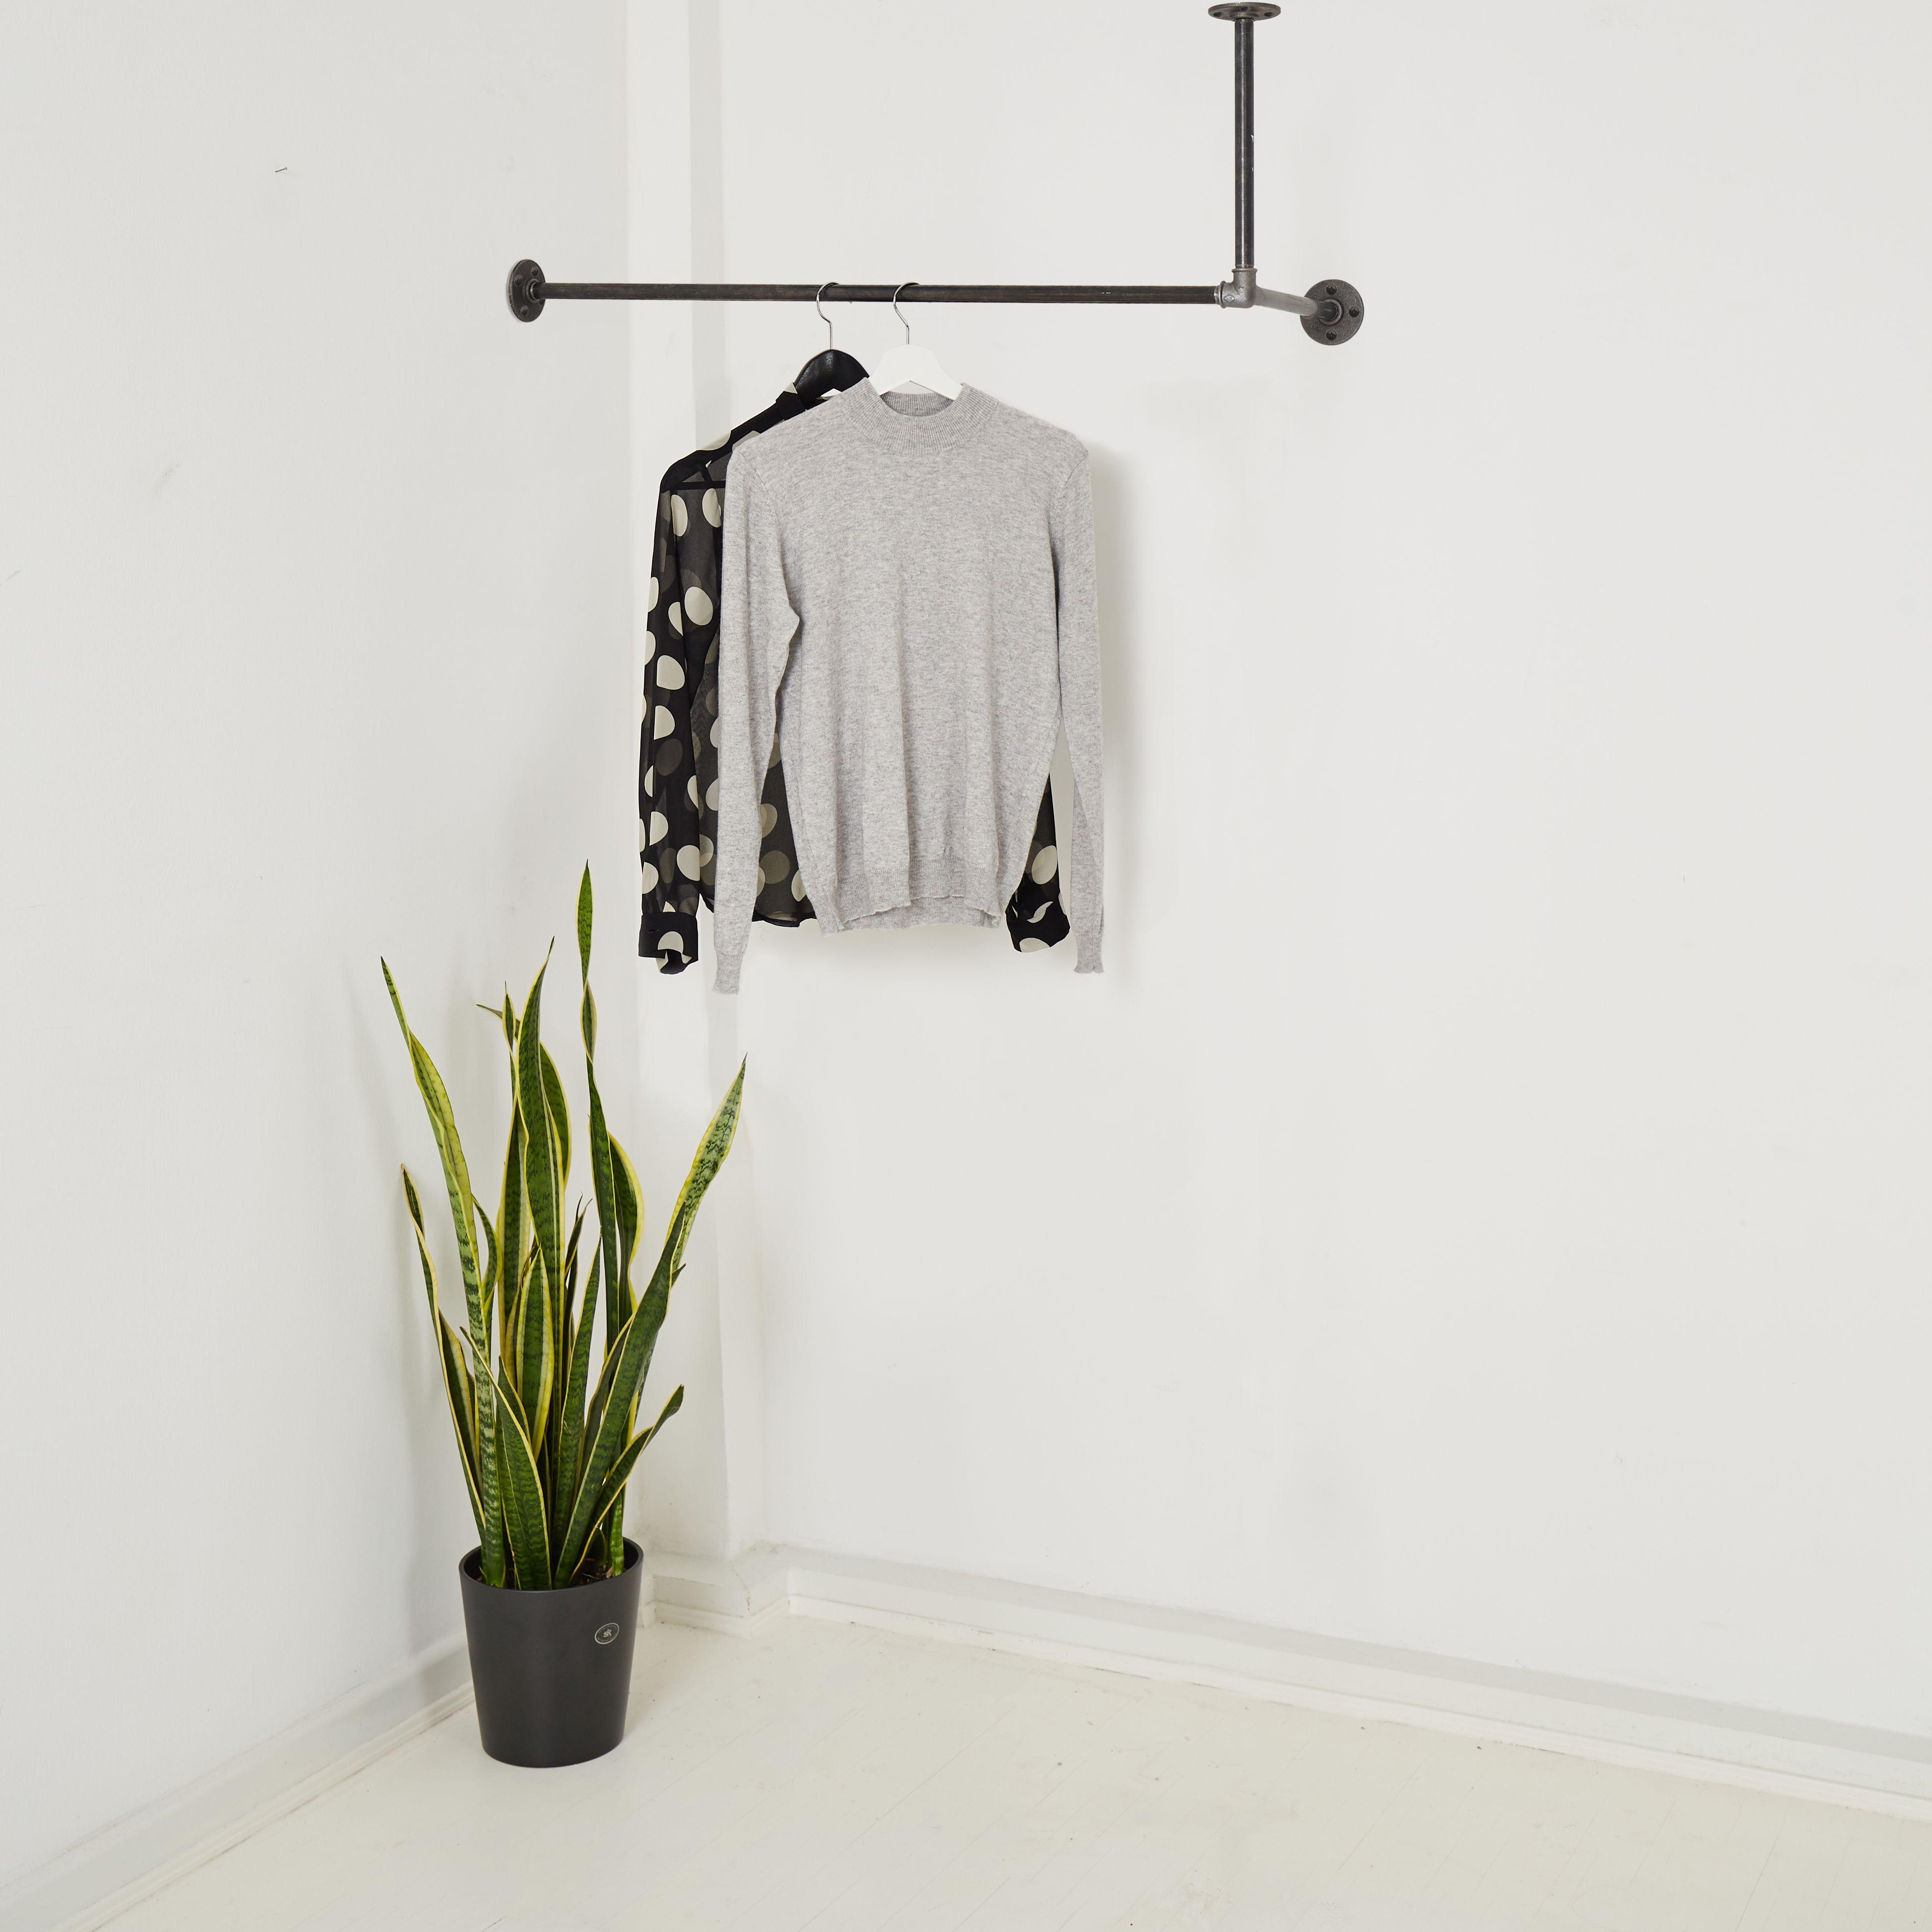 Industrial Design Garderobe Fur Deckenmontage In L Form Hangin Two